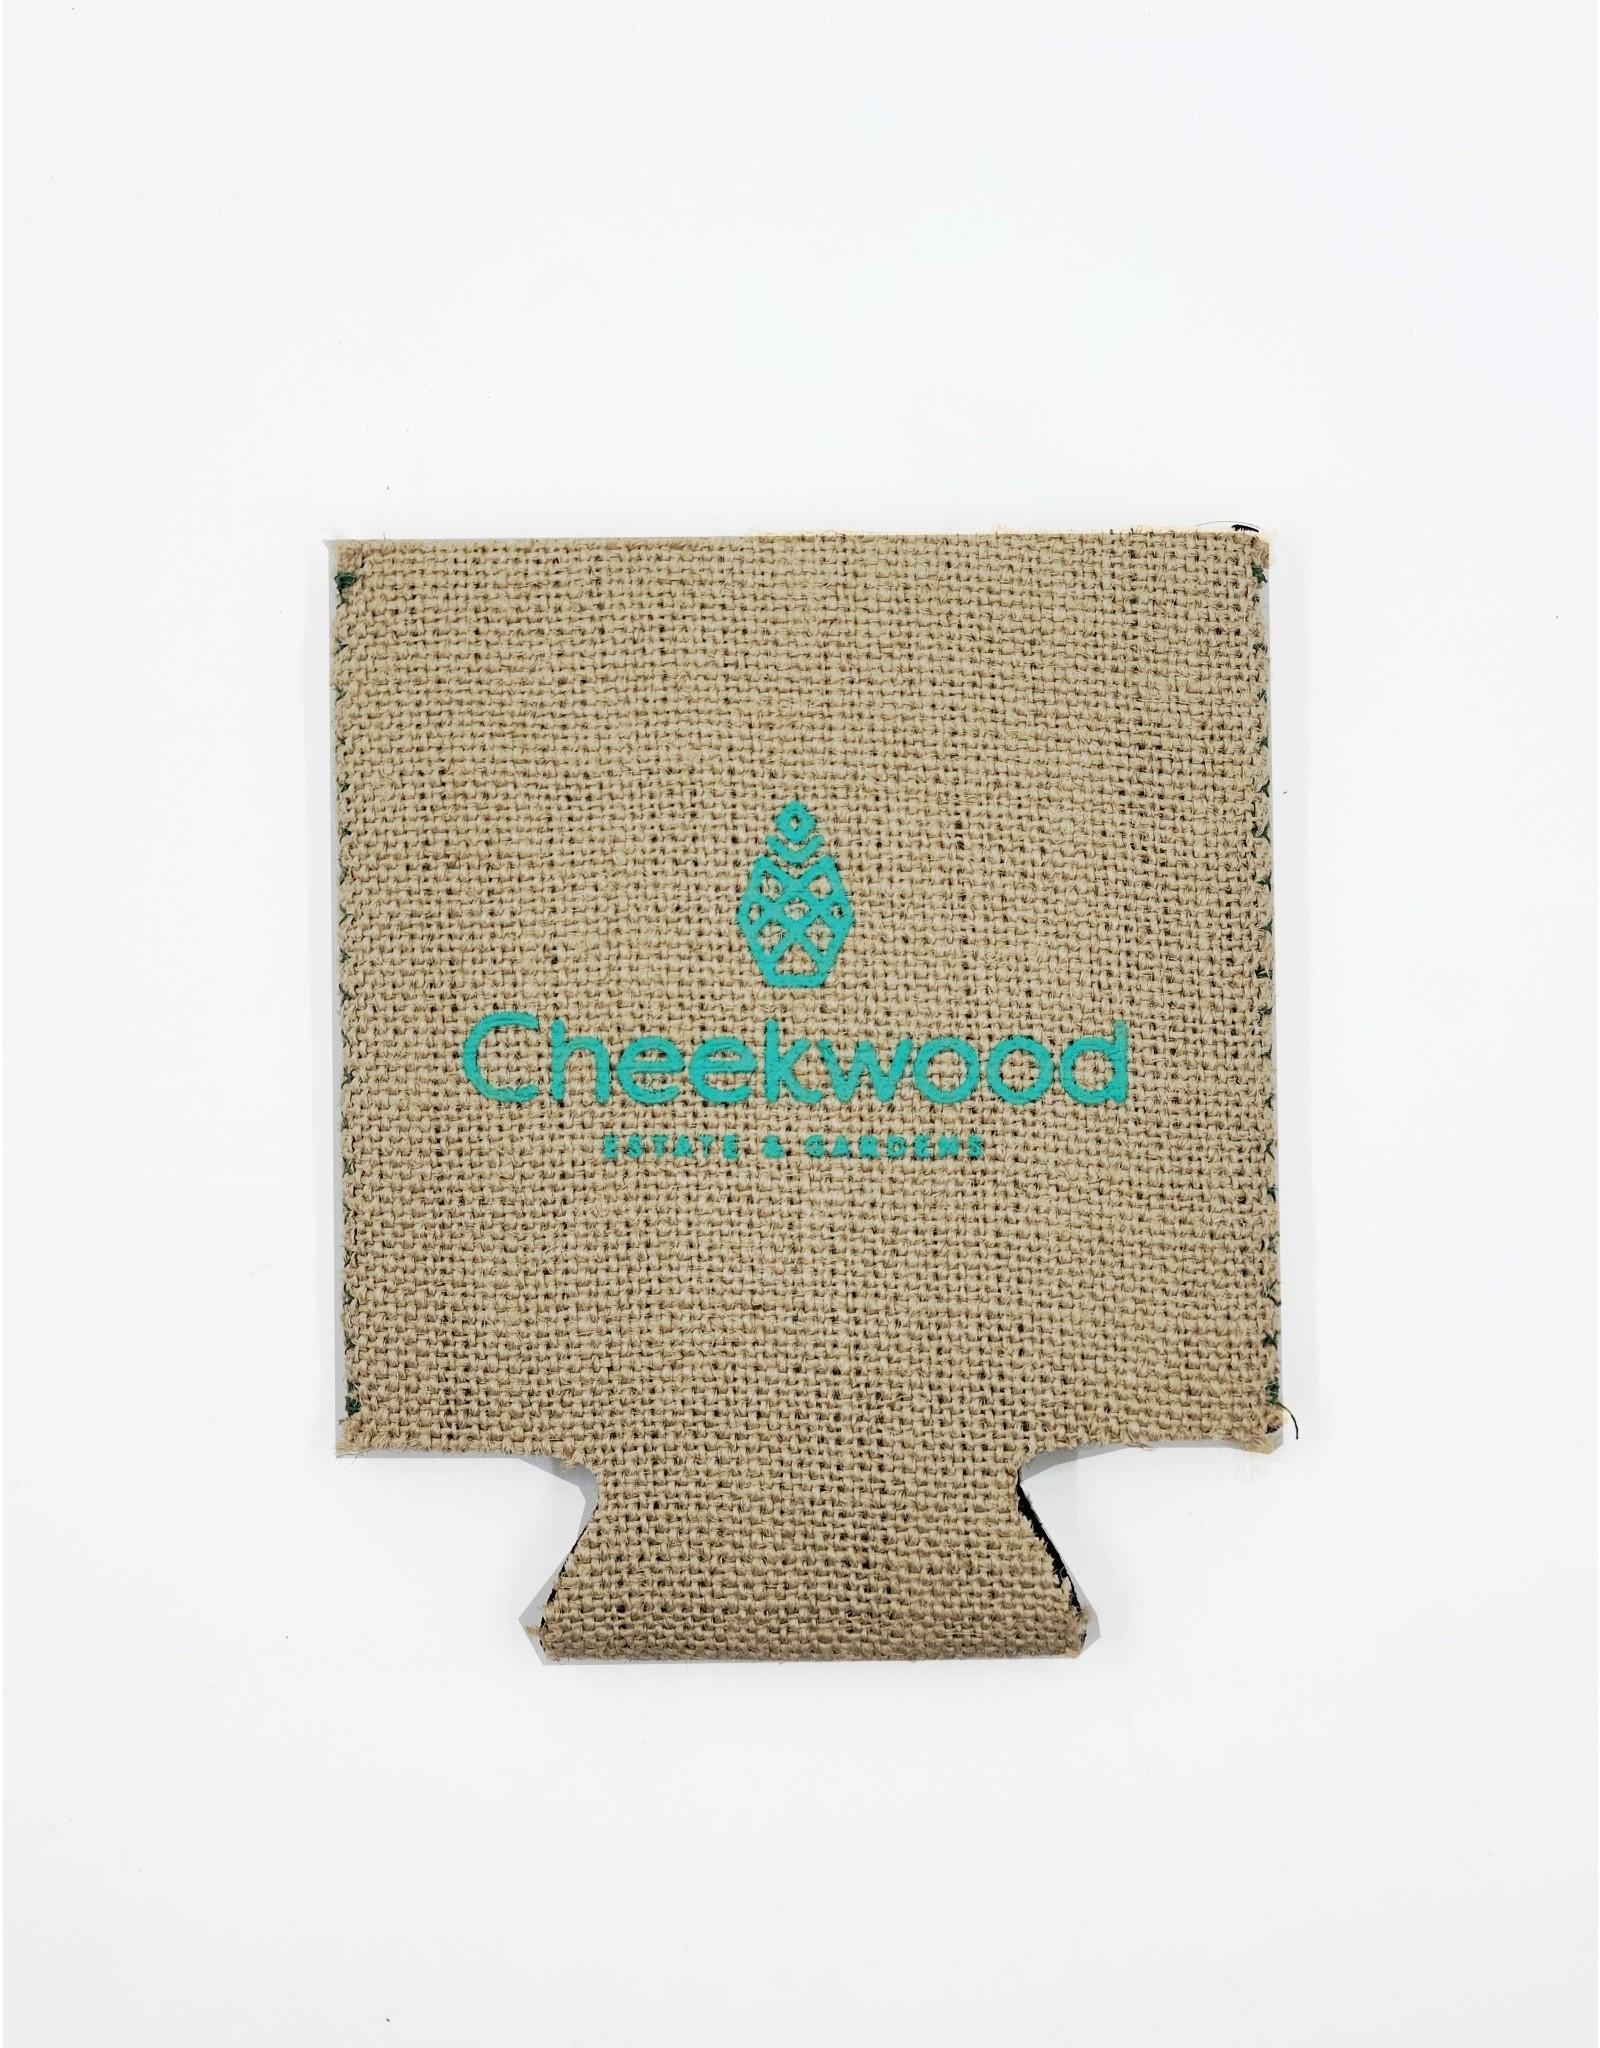 Cheekwood Burlap Koozie